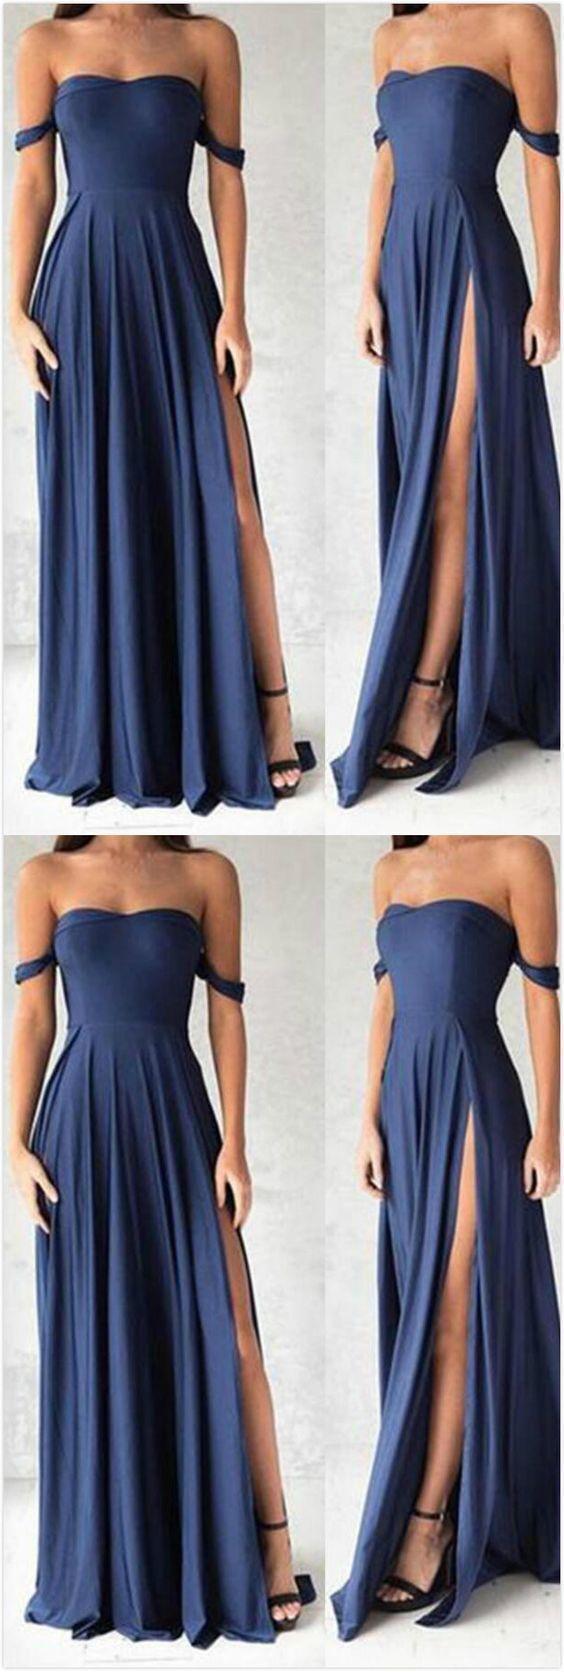 Sexy offshoulder prom dress navy blue chiffon prom dress slit